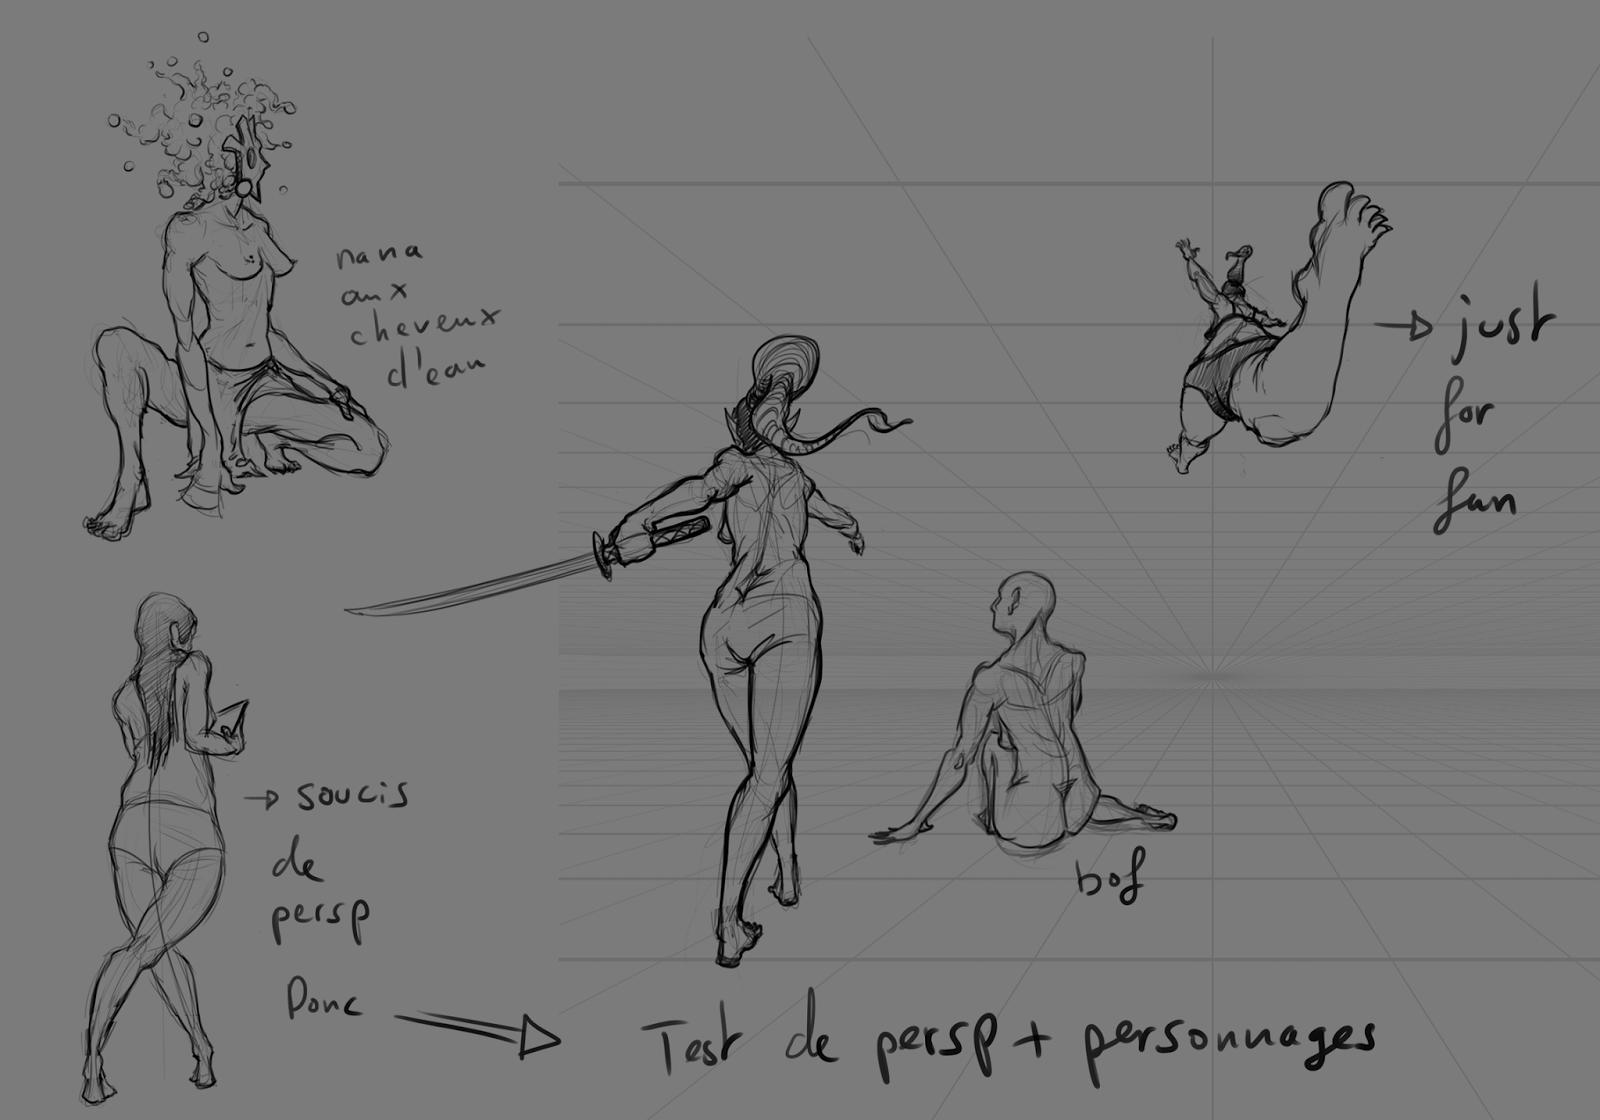 XaB au travail ! [nudity inside] - Page 12 Croquis_2016.10.03